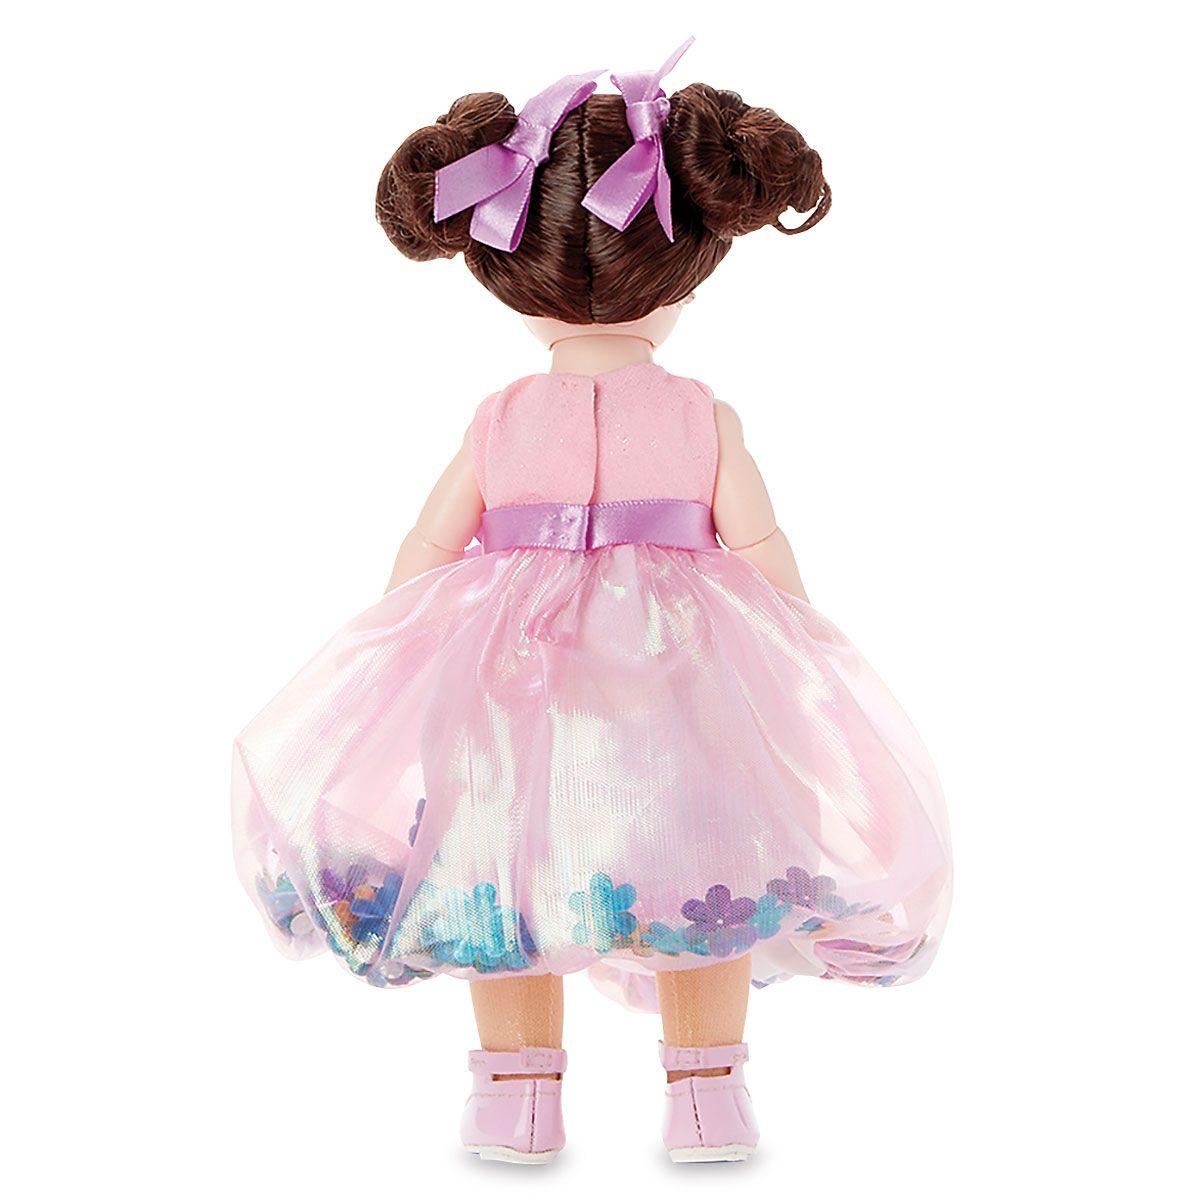 Madame Alexander Birthday Joy Doll